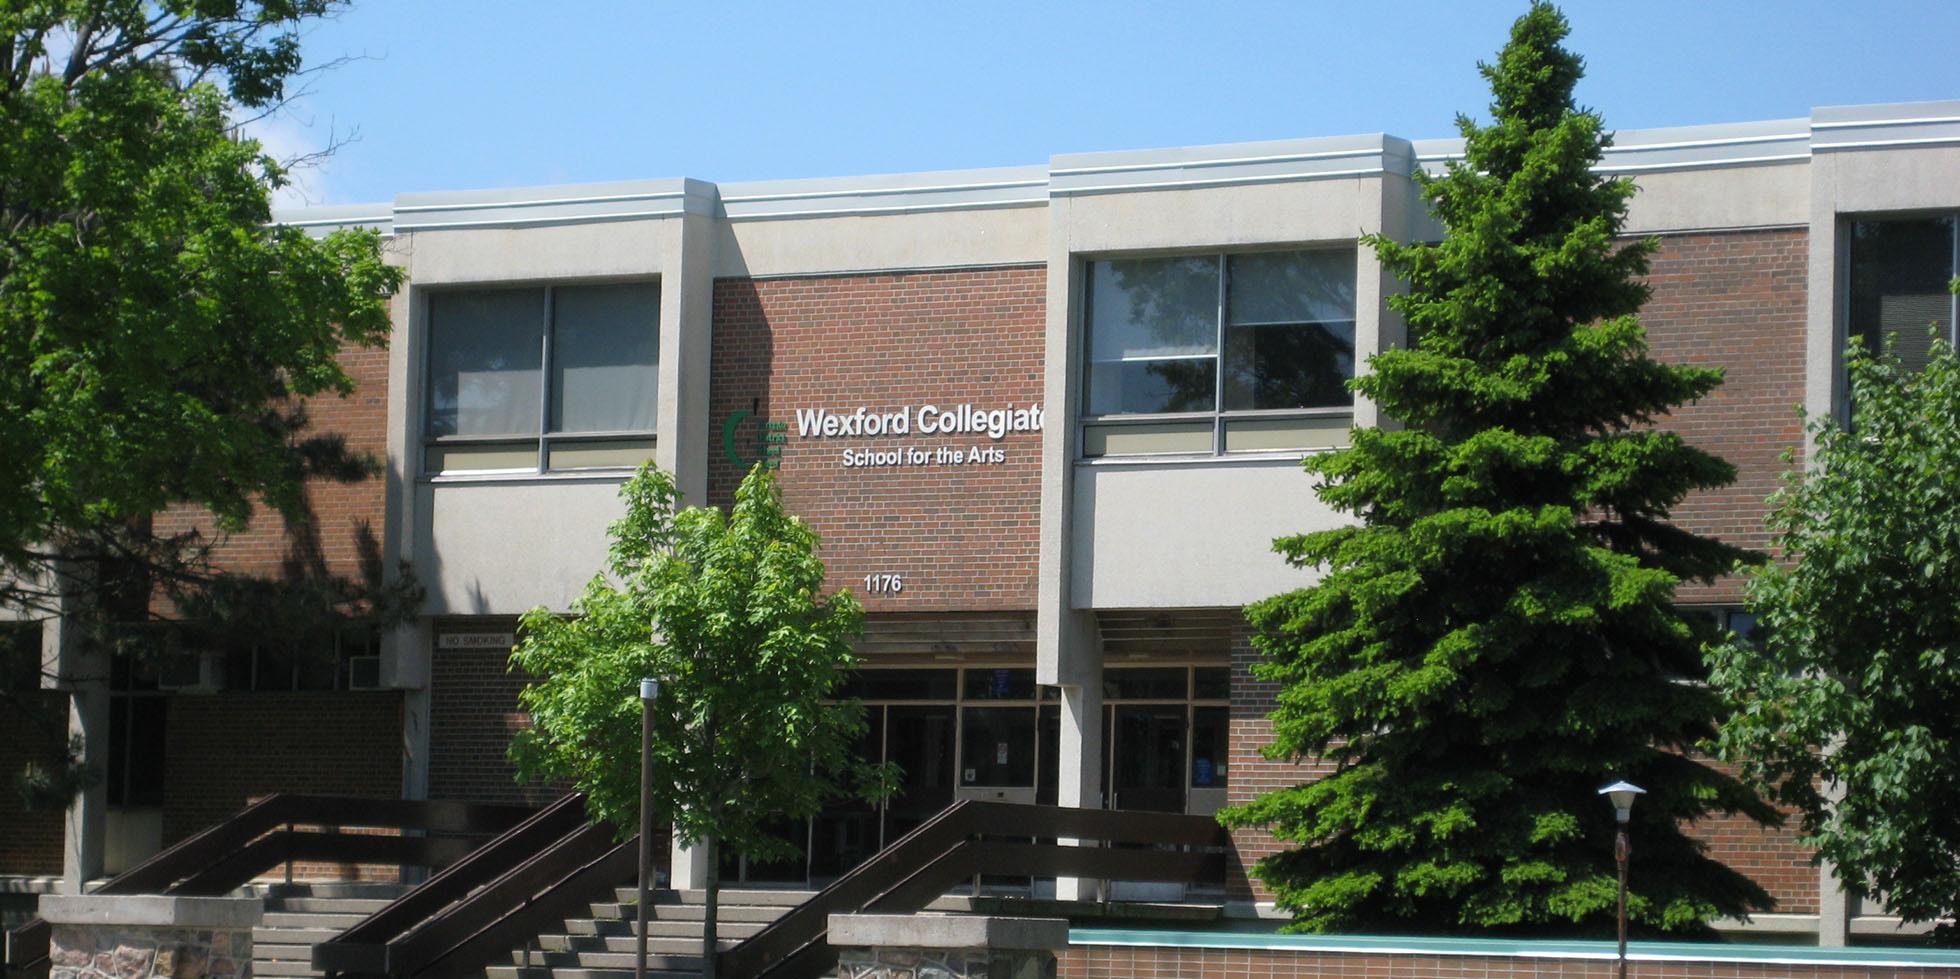 Wexford_Collegiate_Institute 2.jpg